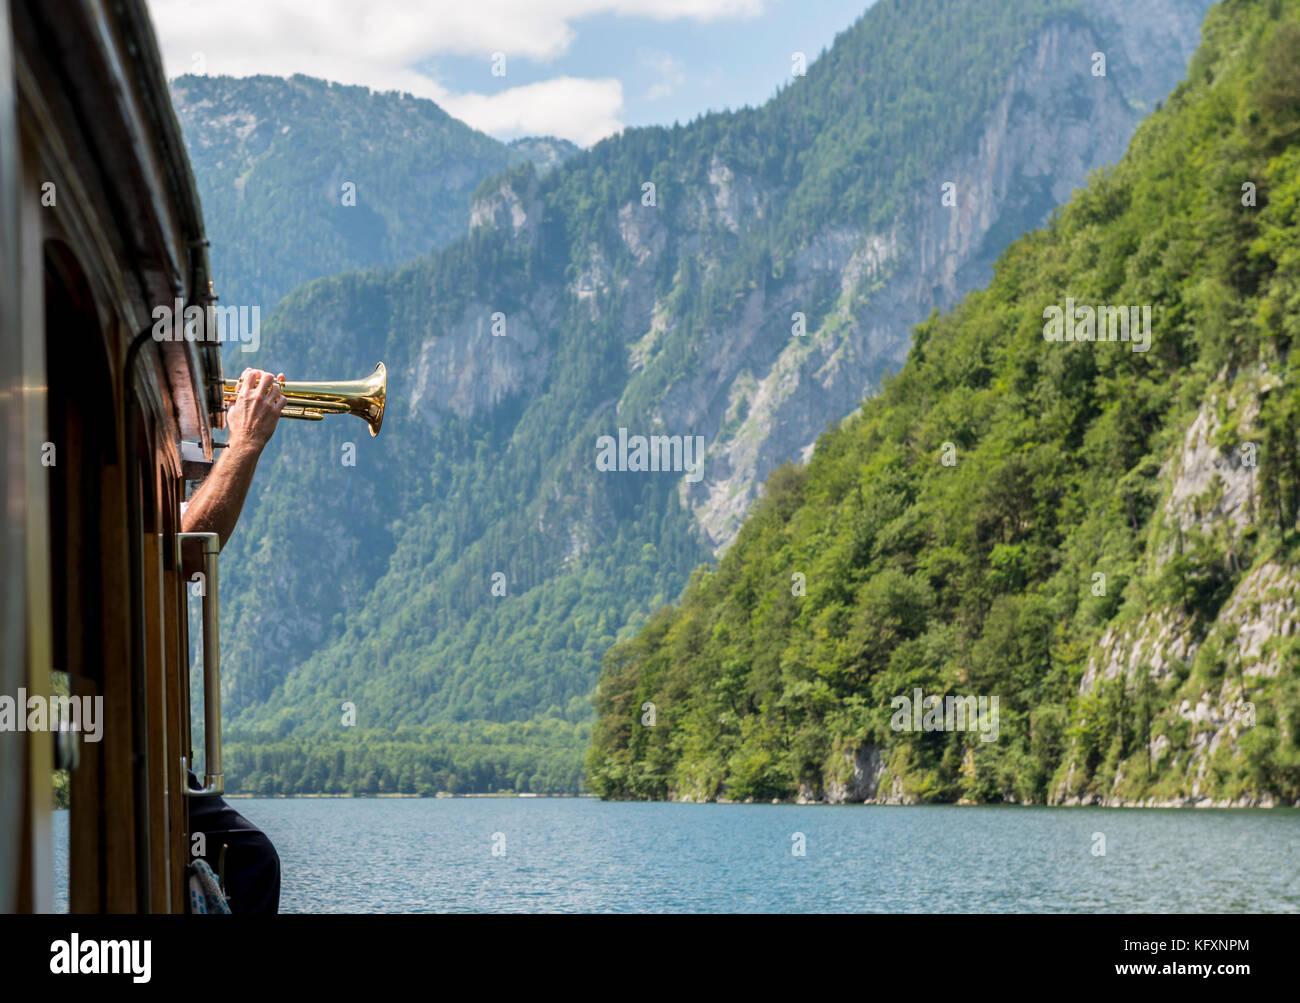 Trumpet for echo, Echowall at the Königsee, Berchtesgaden National Park, Berchtesgadener Land, Upper Bavaria, - Stock Image